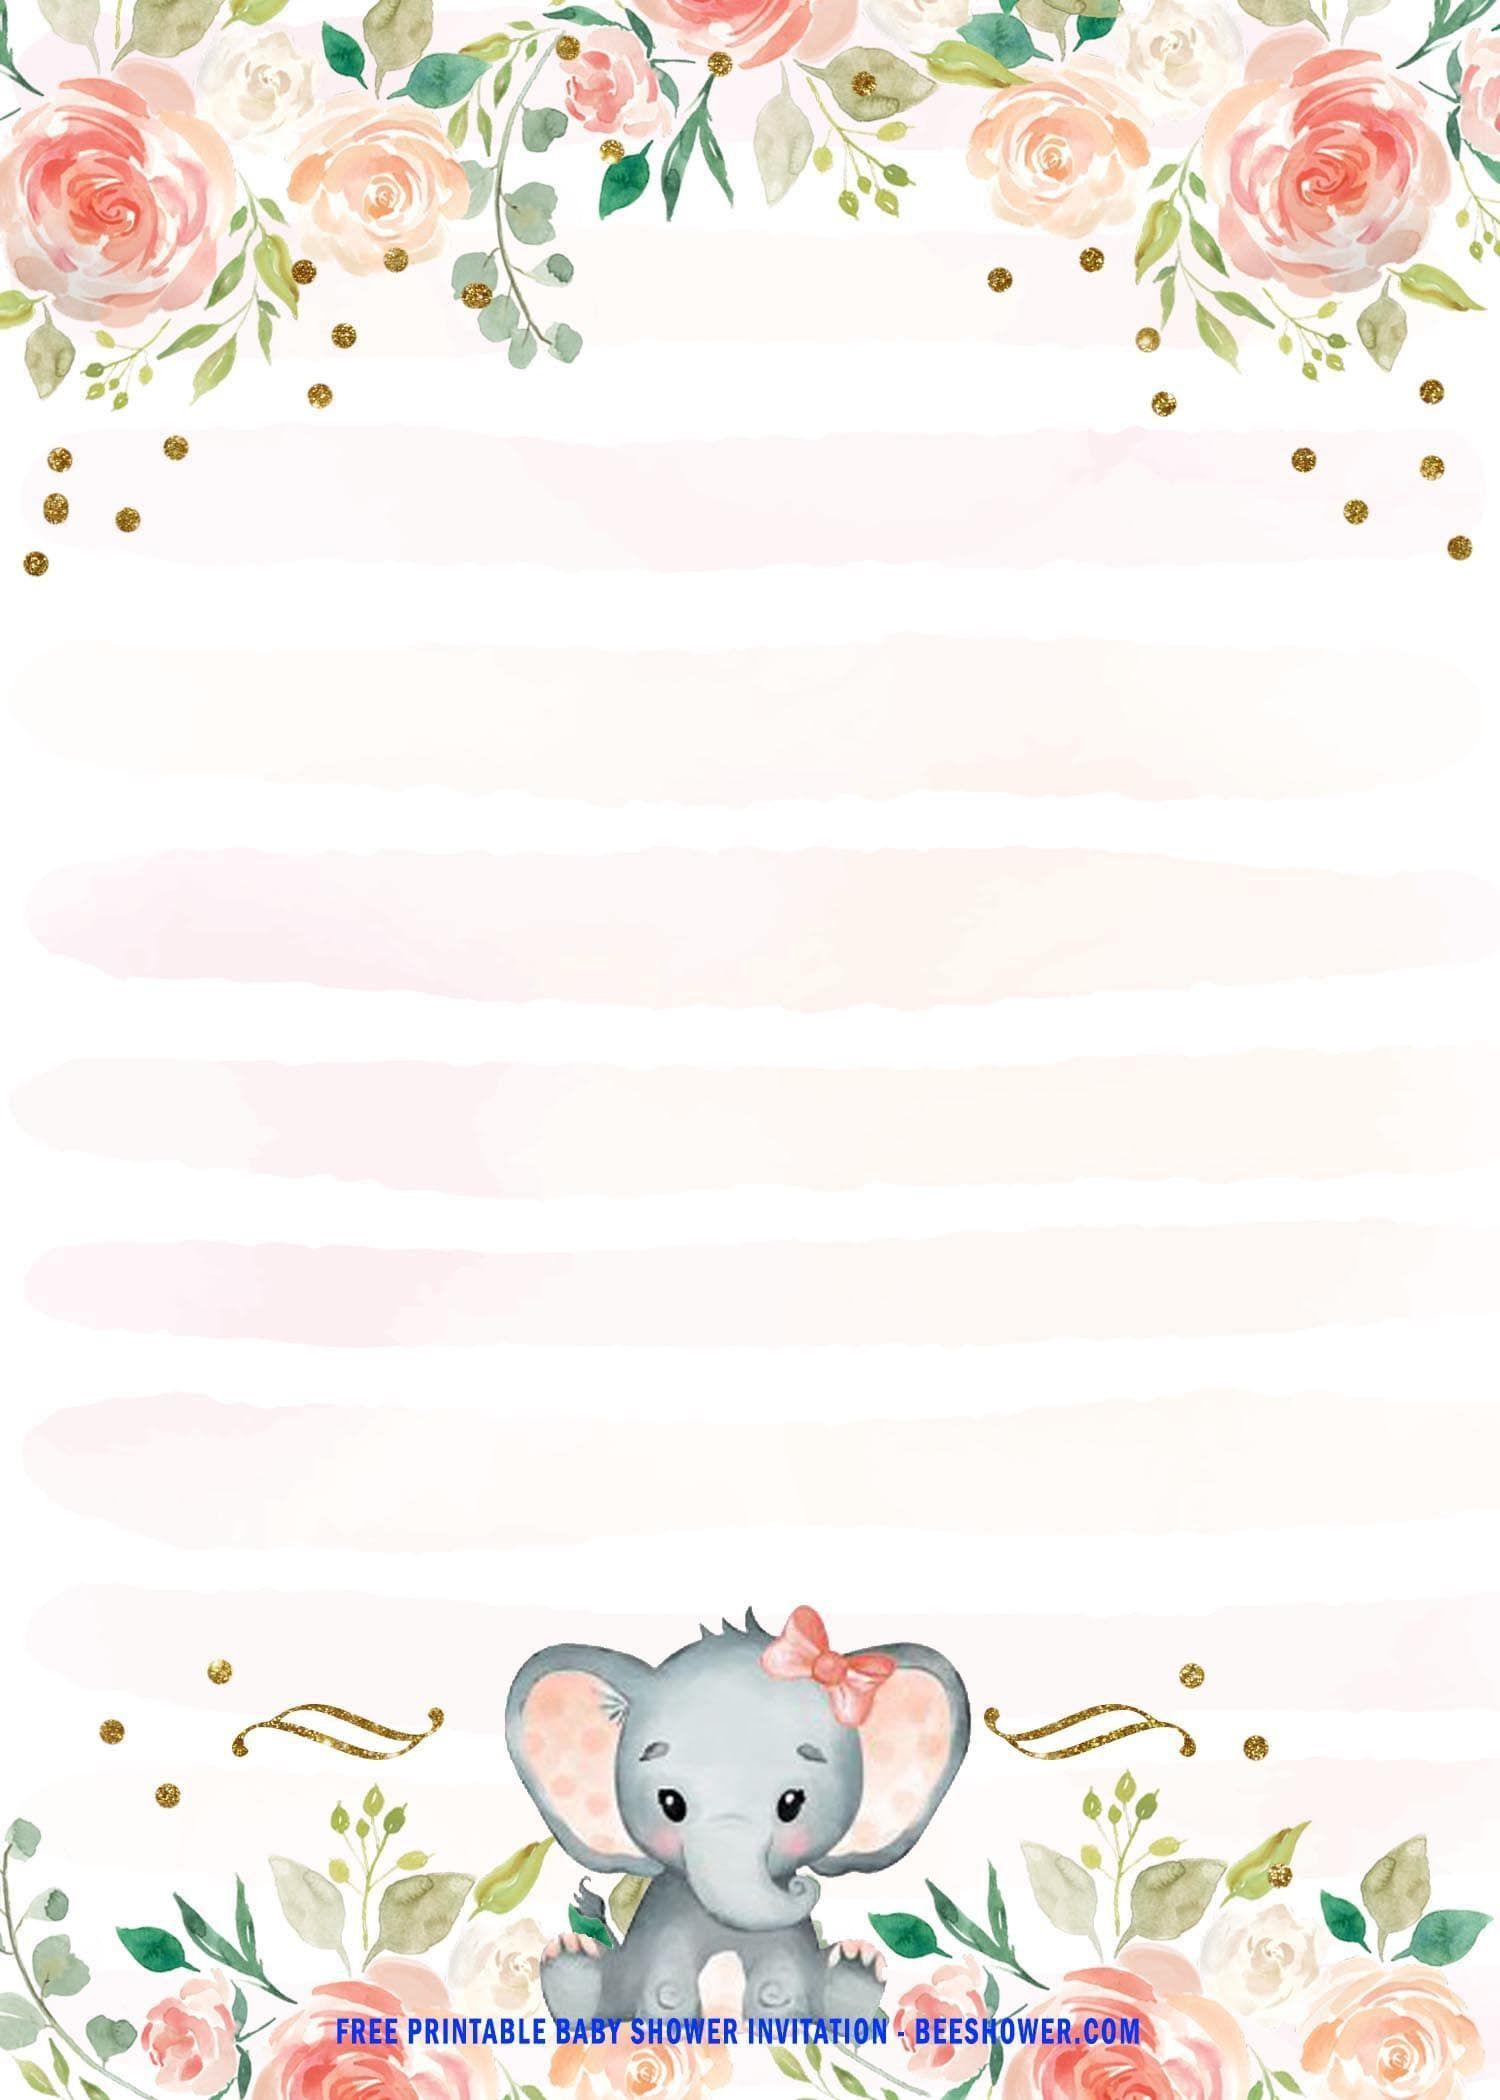 003 Wondrou Elephant Baby Shower Invitation Template Picture  Templates Free Pdf BoyFull